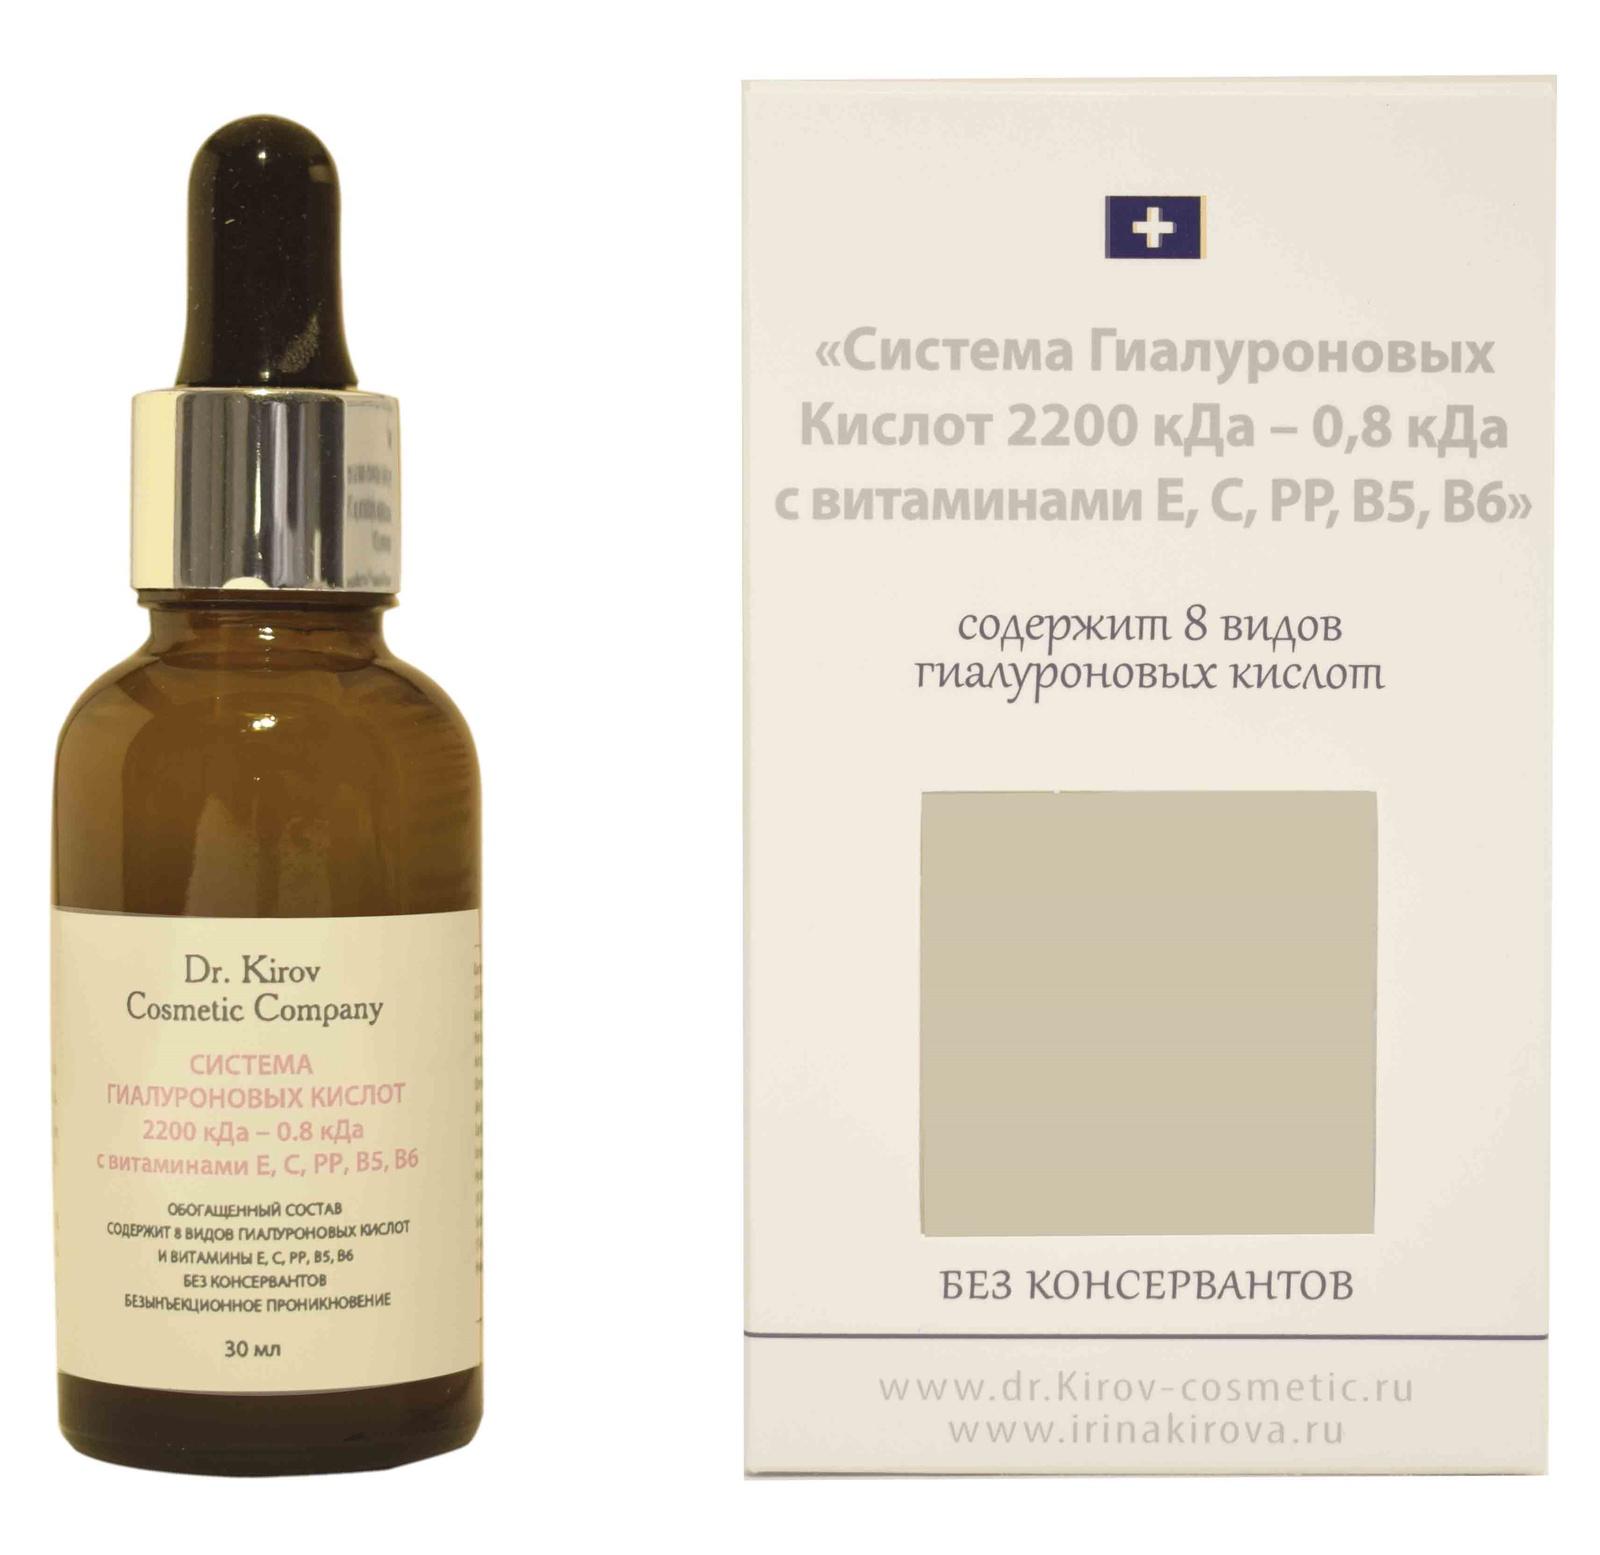 Dr. Kirov Cosmetic Company,Гель гиалуроновый